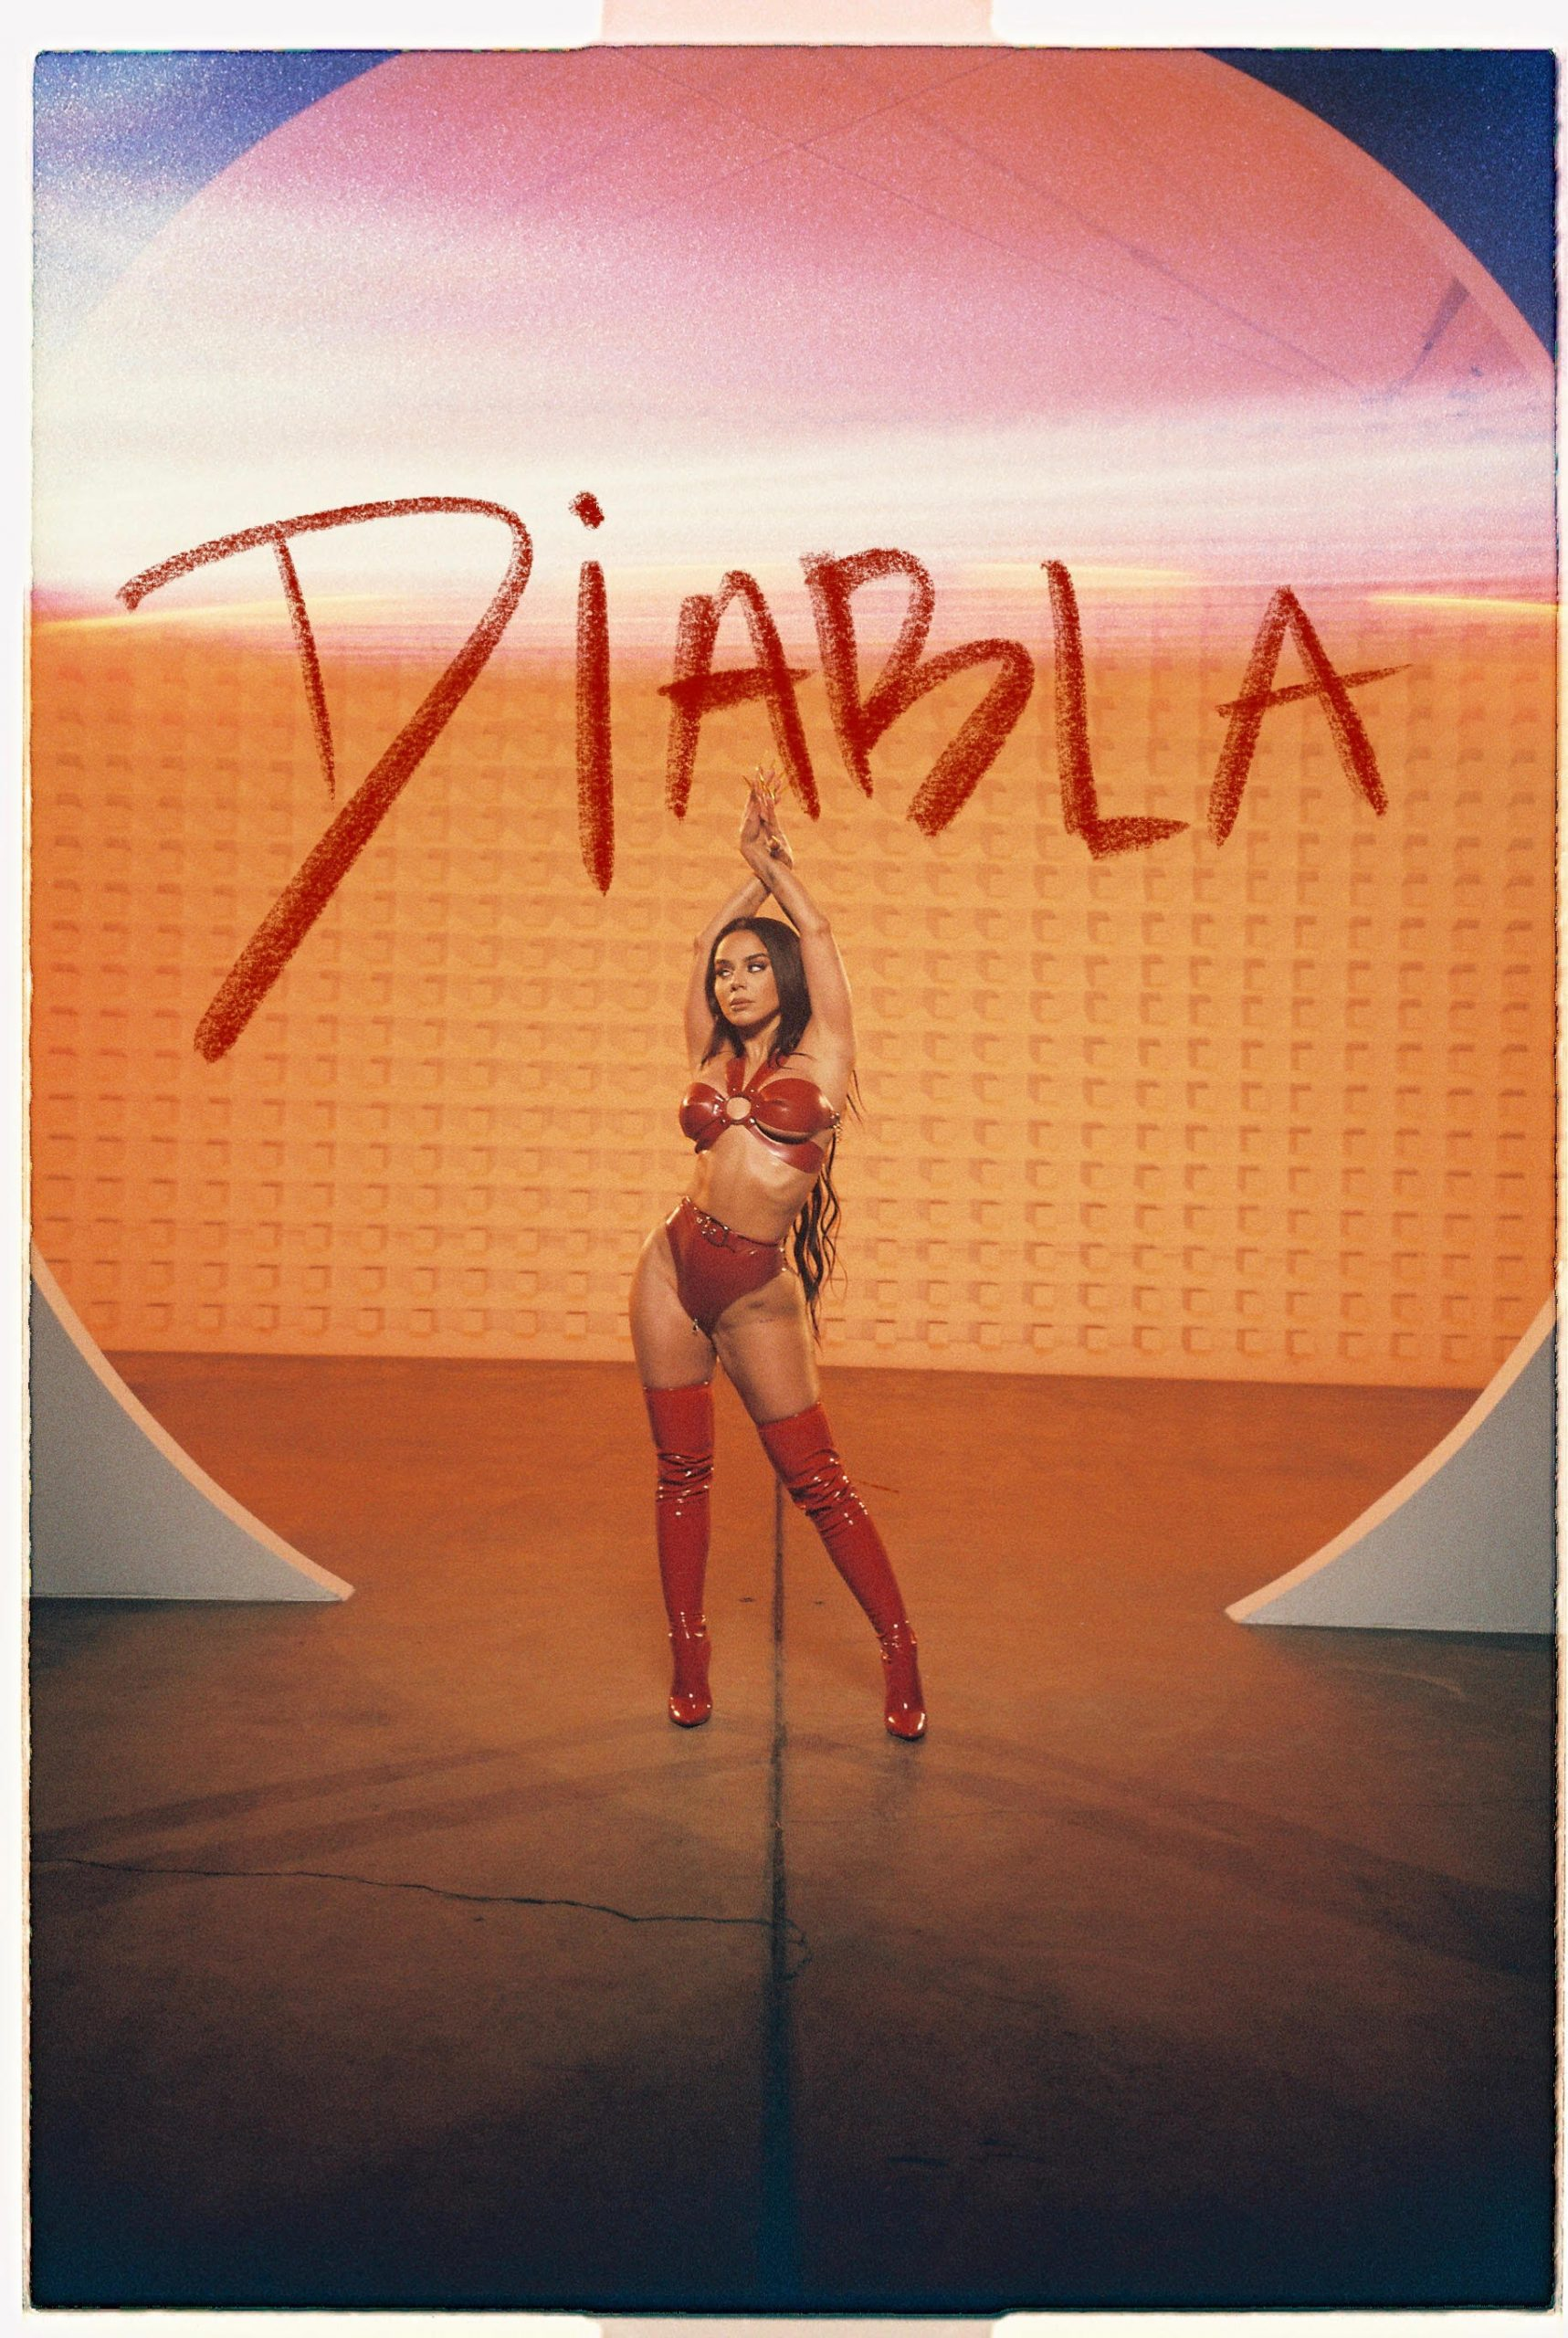 "Izzy La Diabla estrena su nuevo sencillo ""Diabla"""